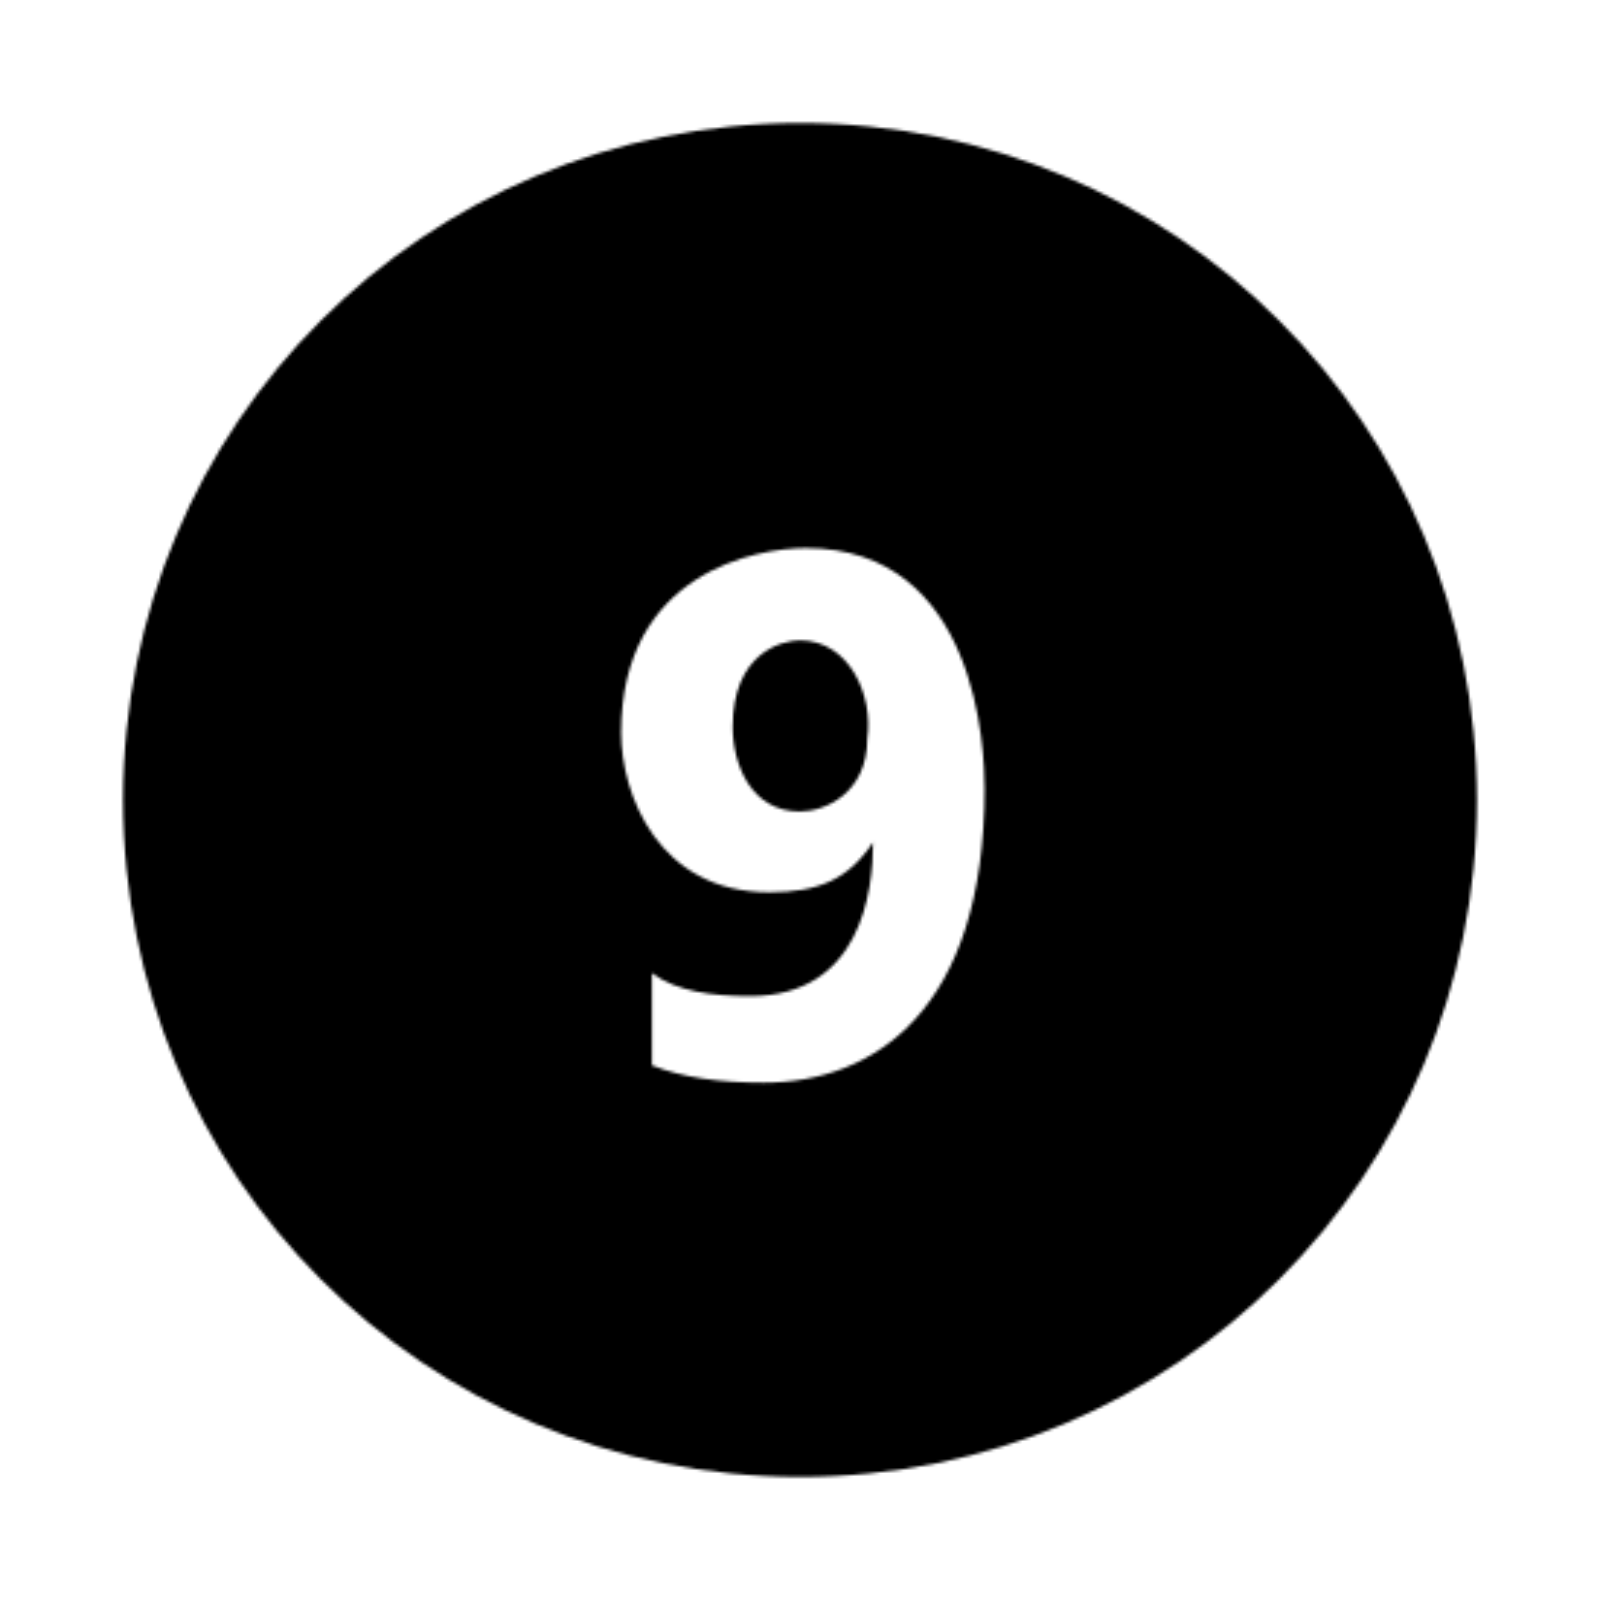 9 circulado C icon